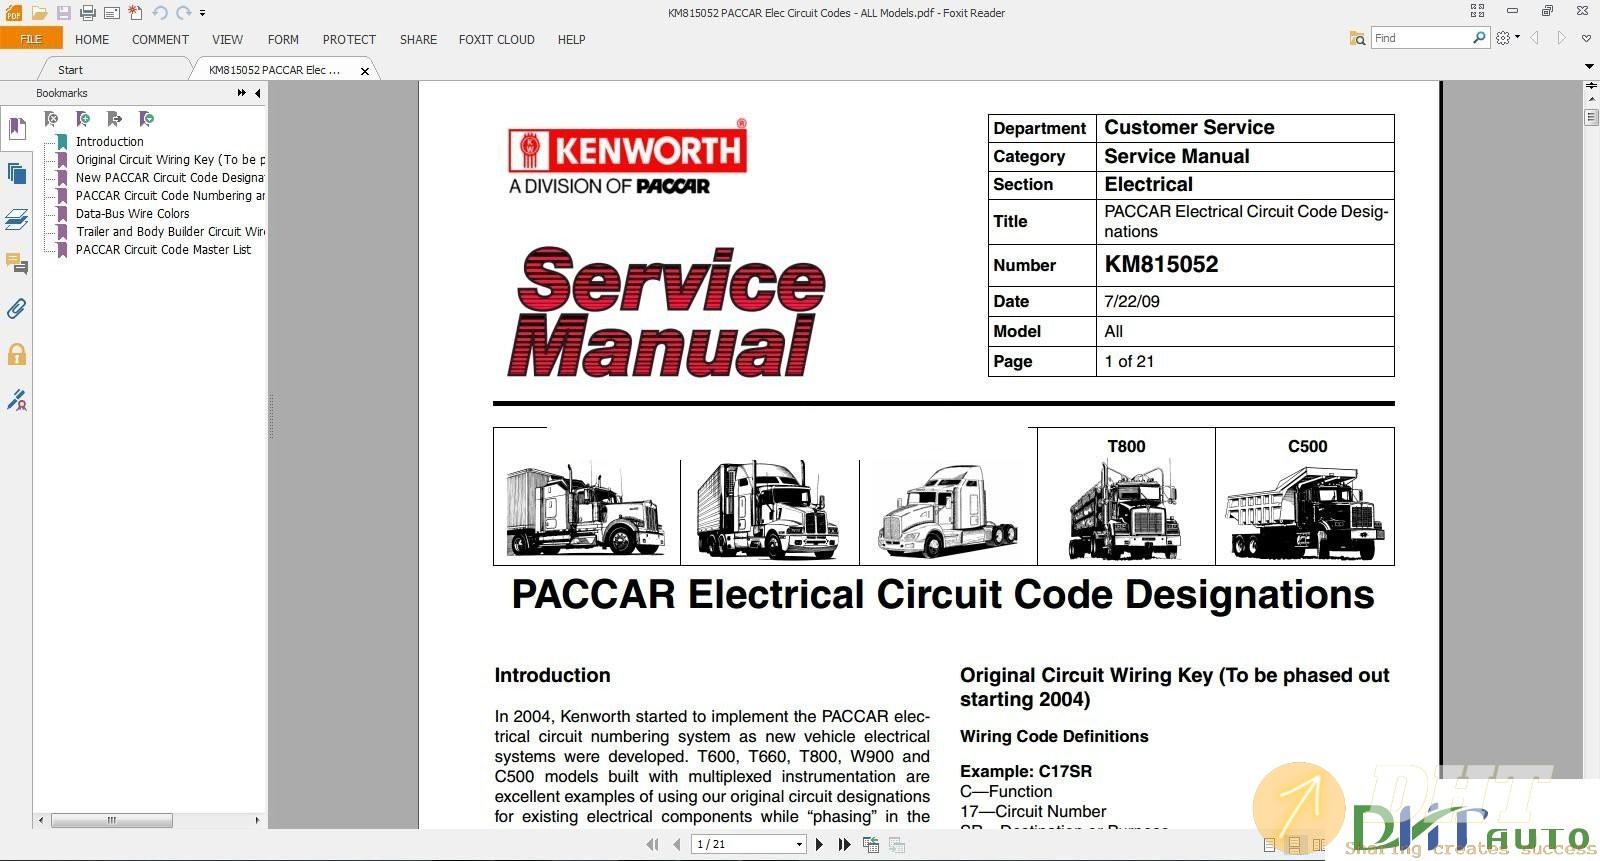 Kenworth Truck Service Manual Full 2.jpg